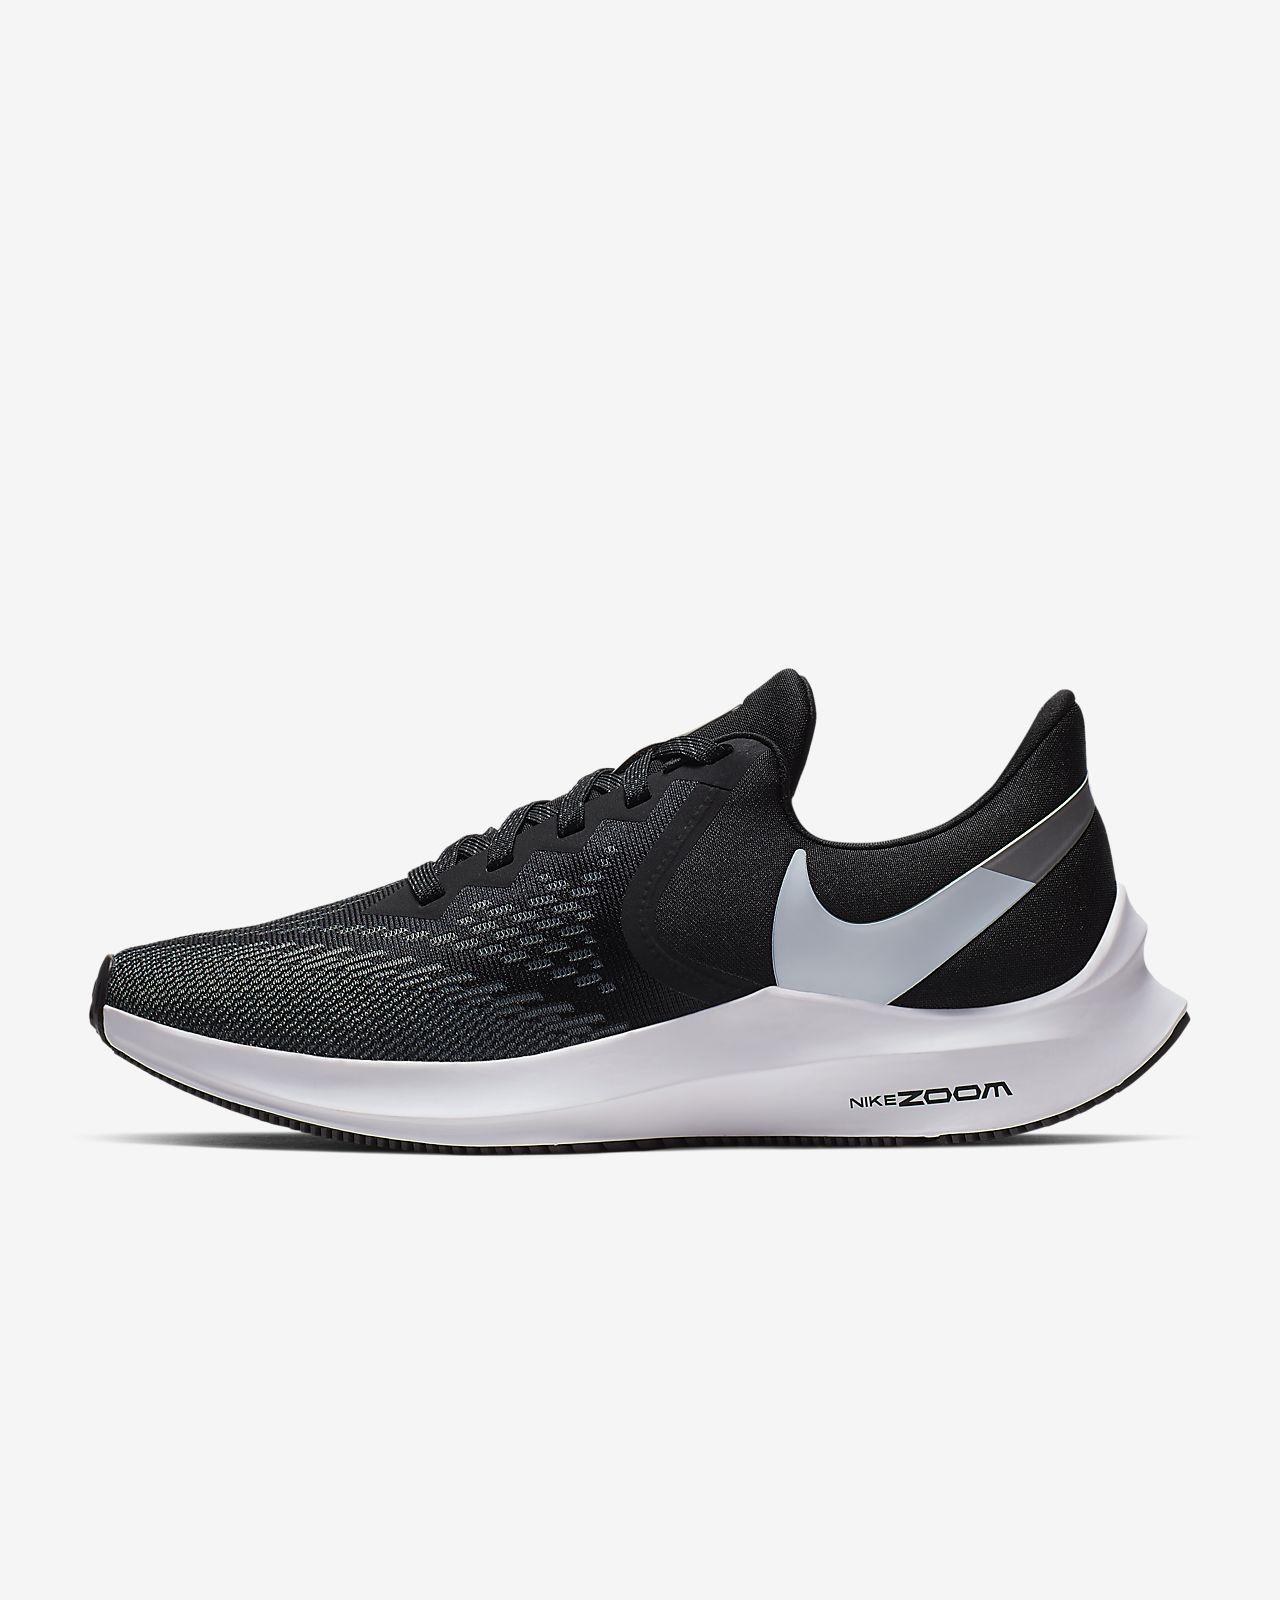 official photos 8bcb1 fee84 Women s Running Shoe. Nike Air Zoom Winflo 6